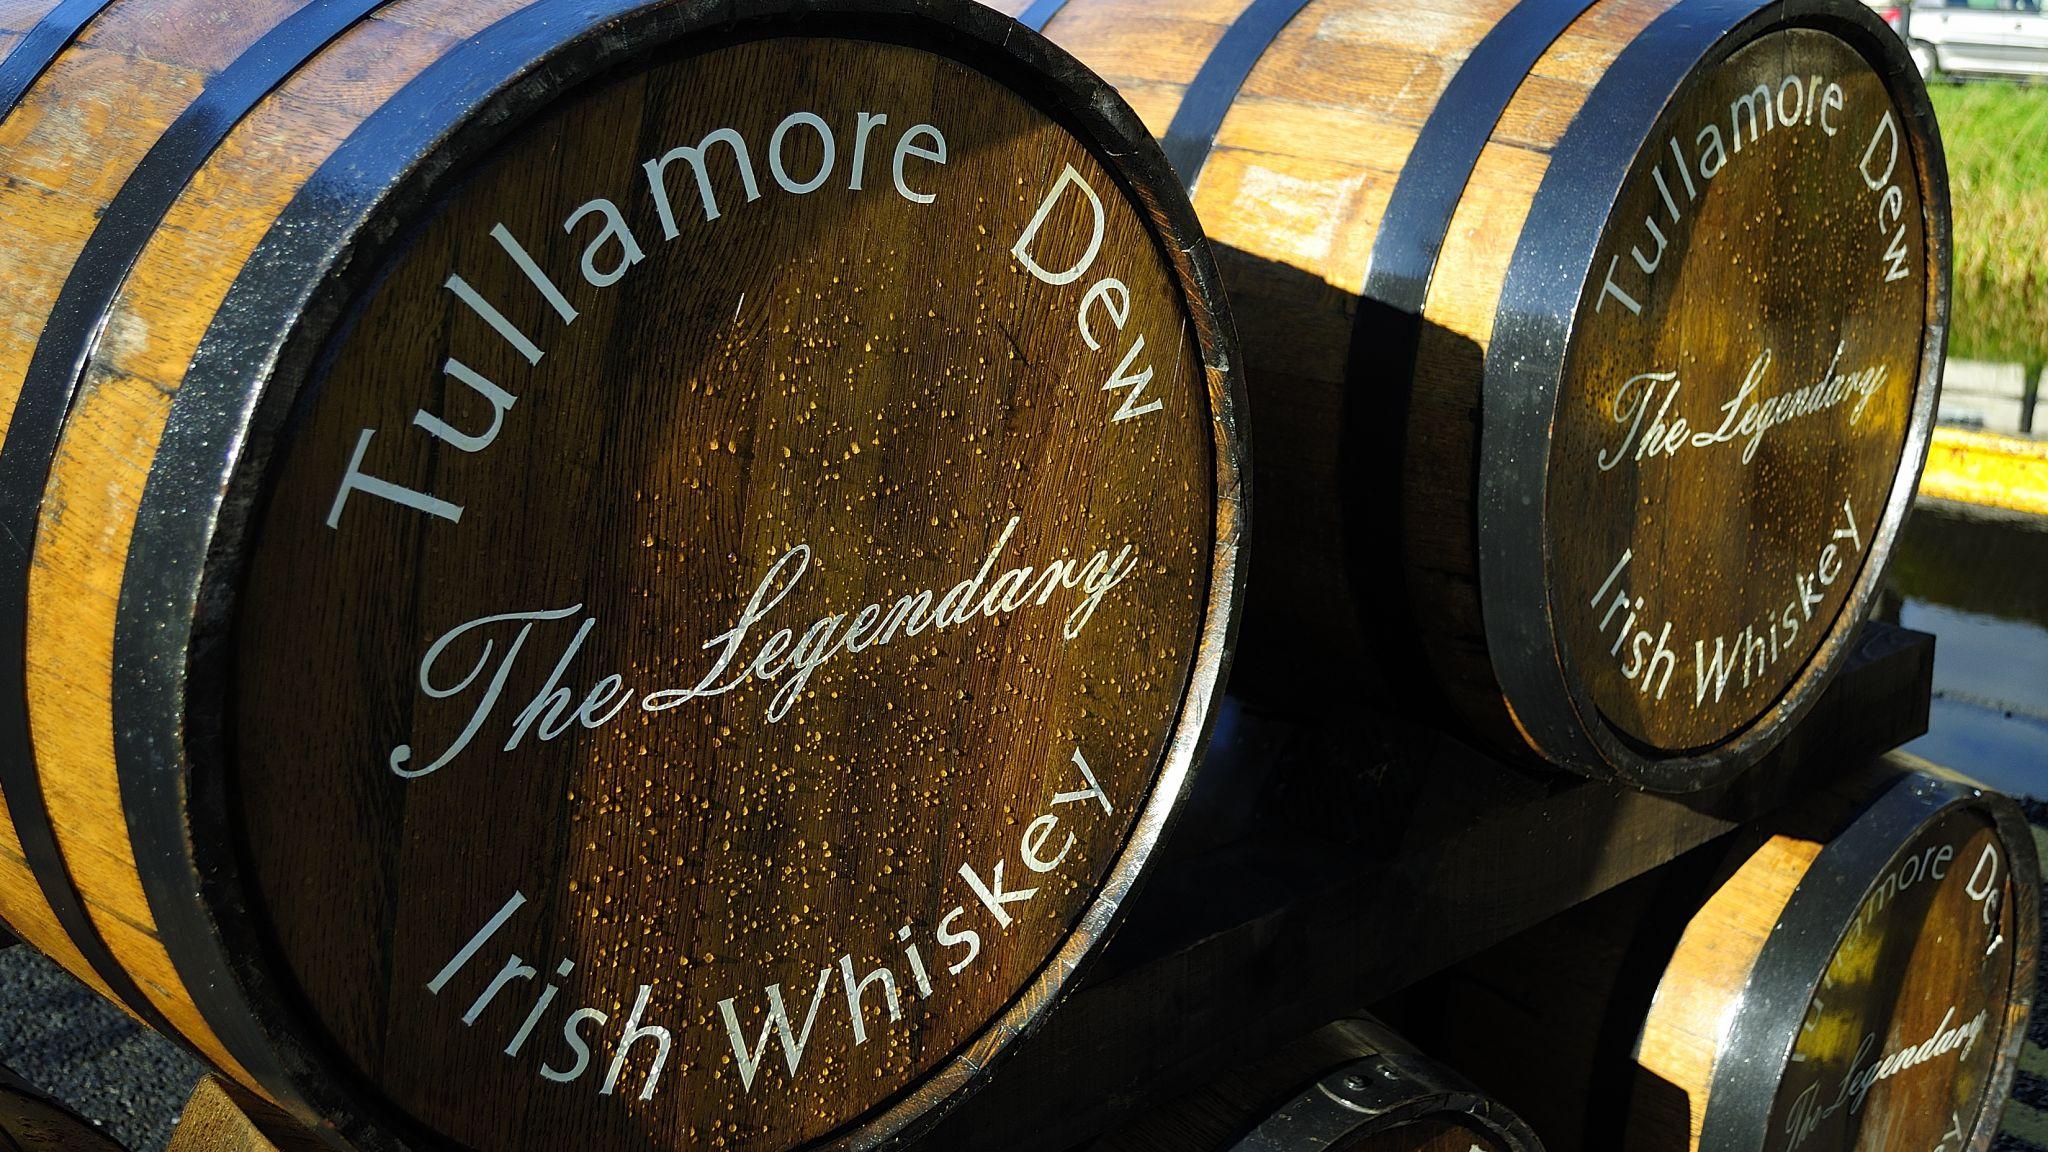 Irish Whiskey, Tullamore., Ireland